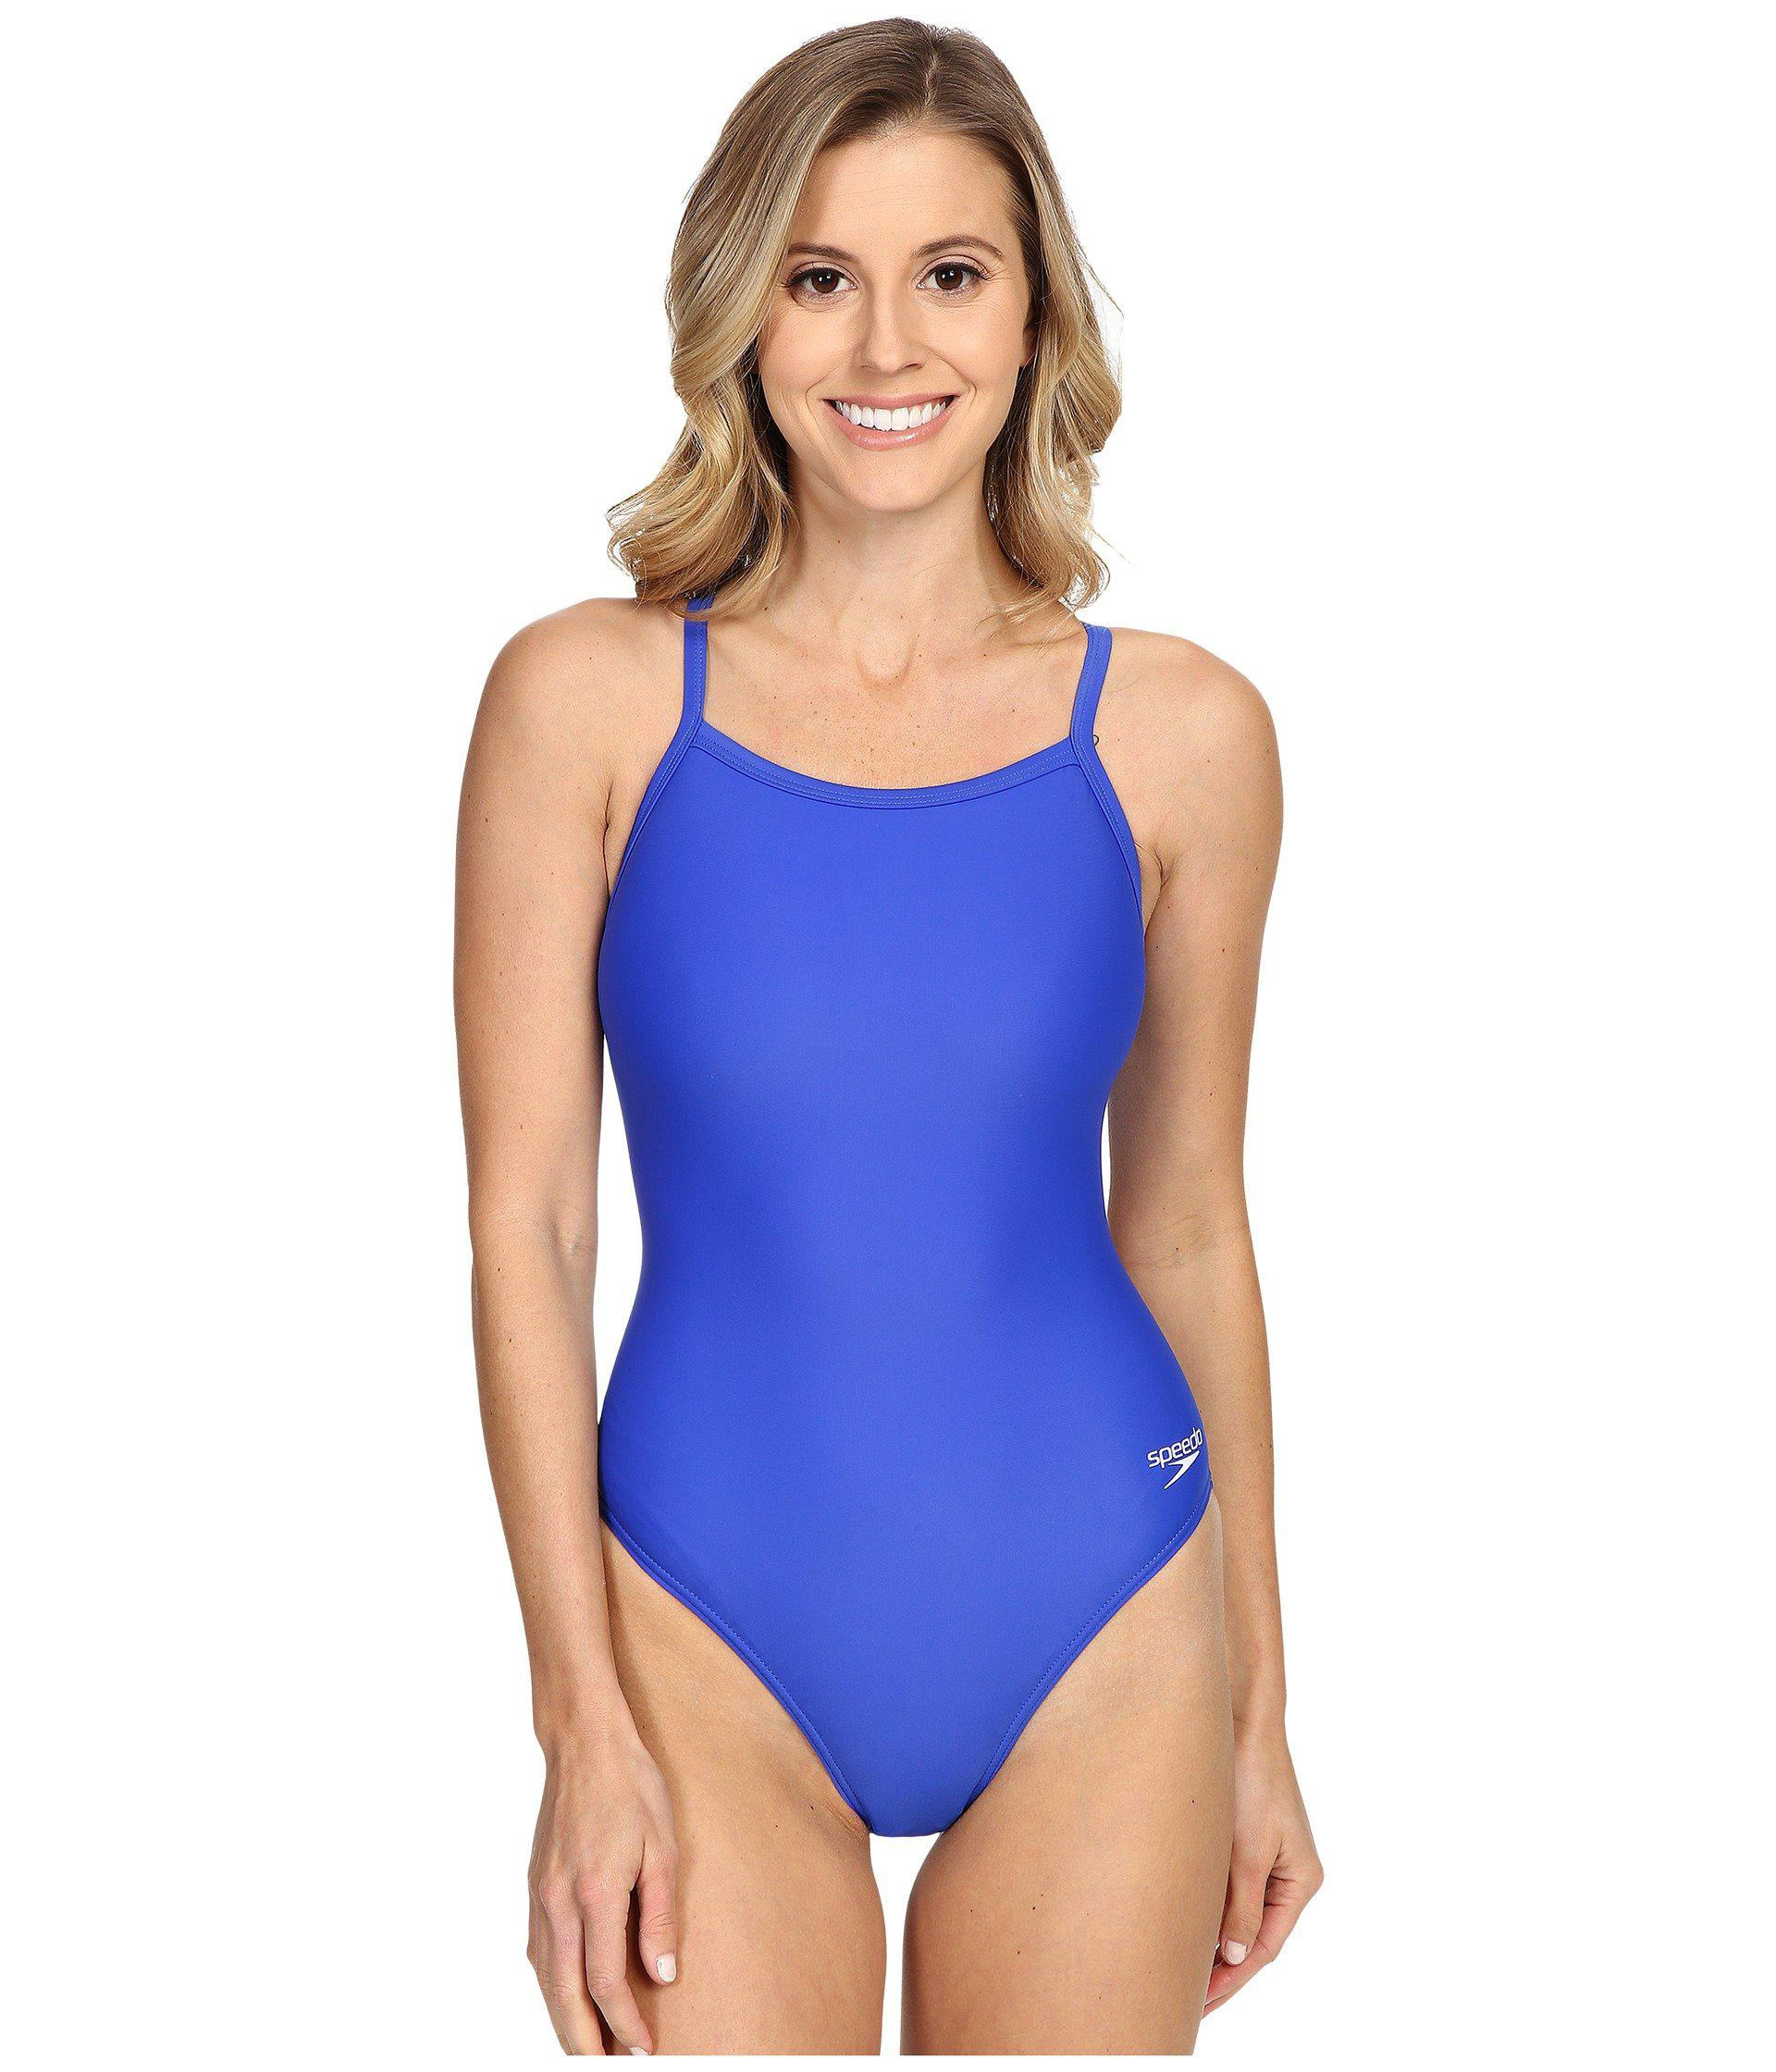 6457ea9472 Speedo - Blue Powerflex Eco Solid Flyback One-piece (new Black) Women s  Swimsuits. View fullscreen